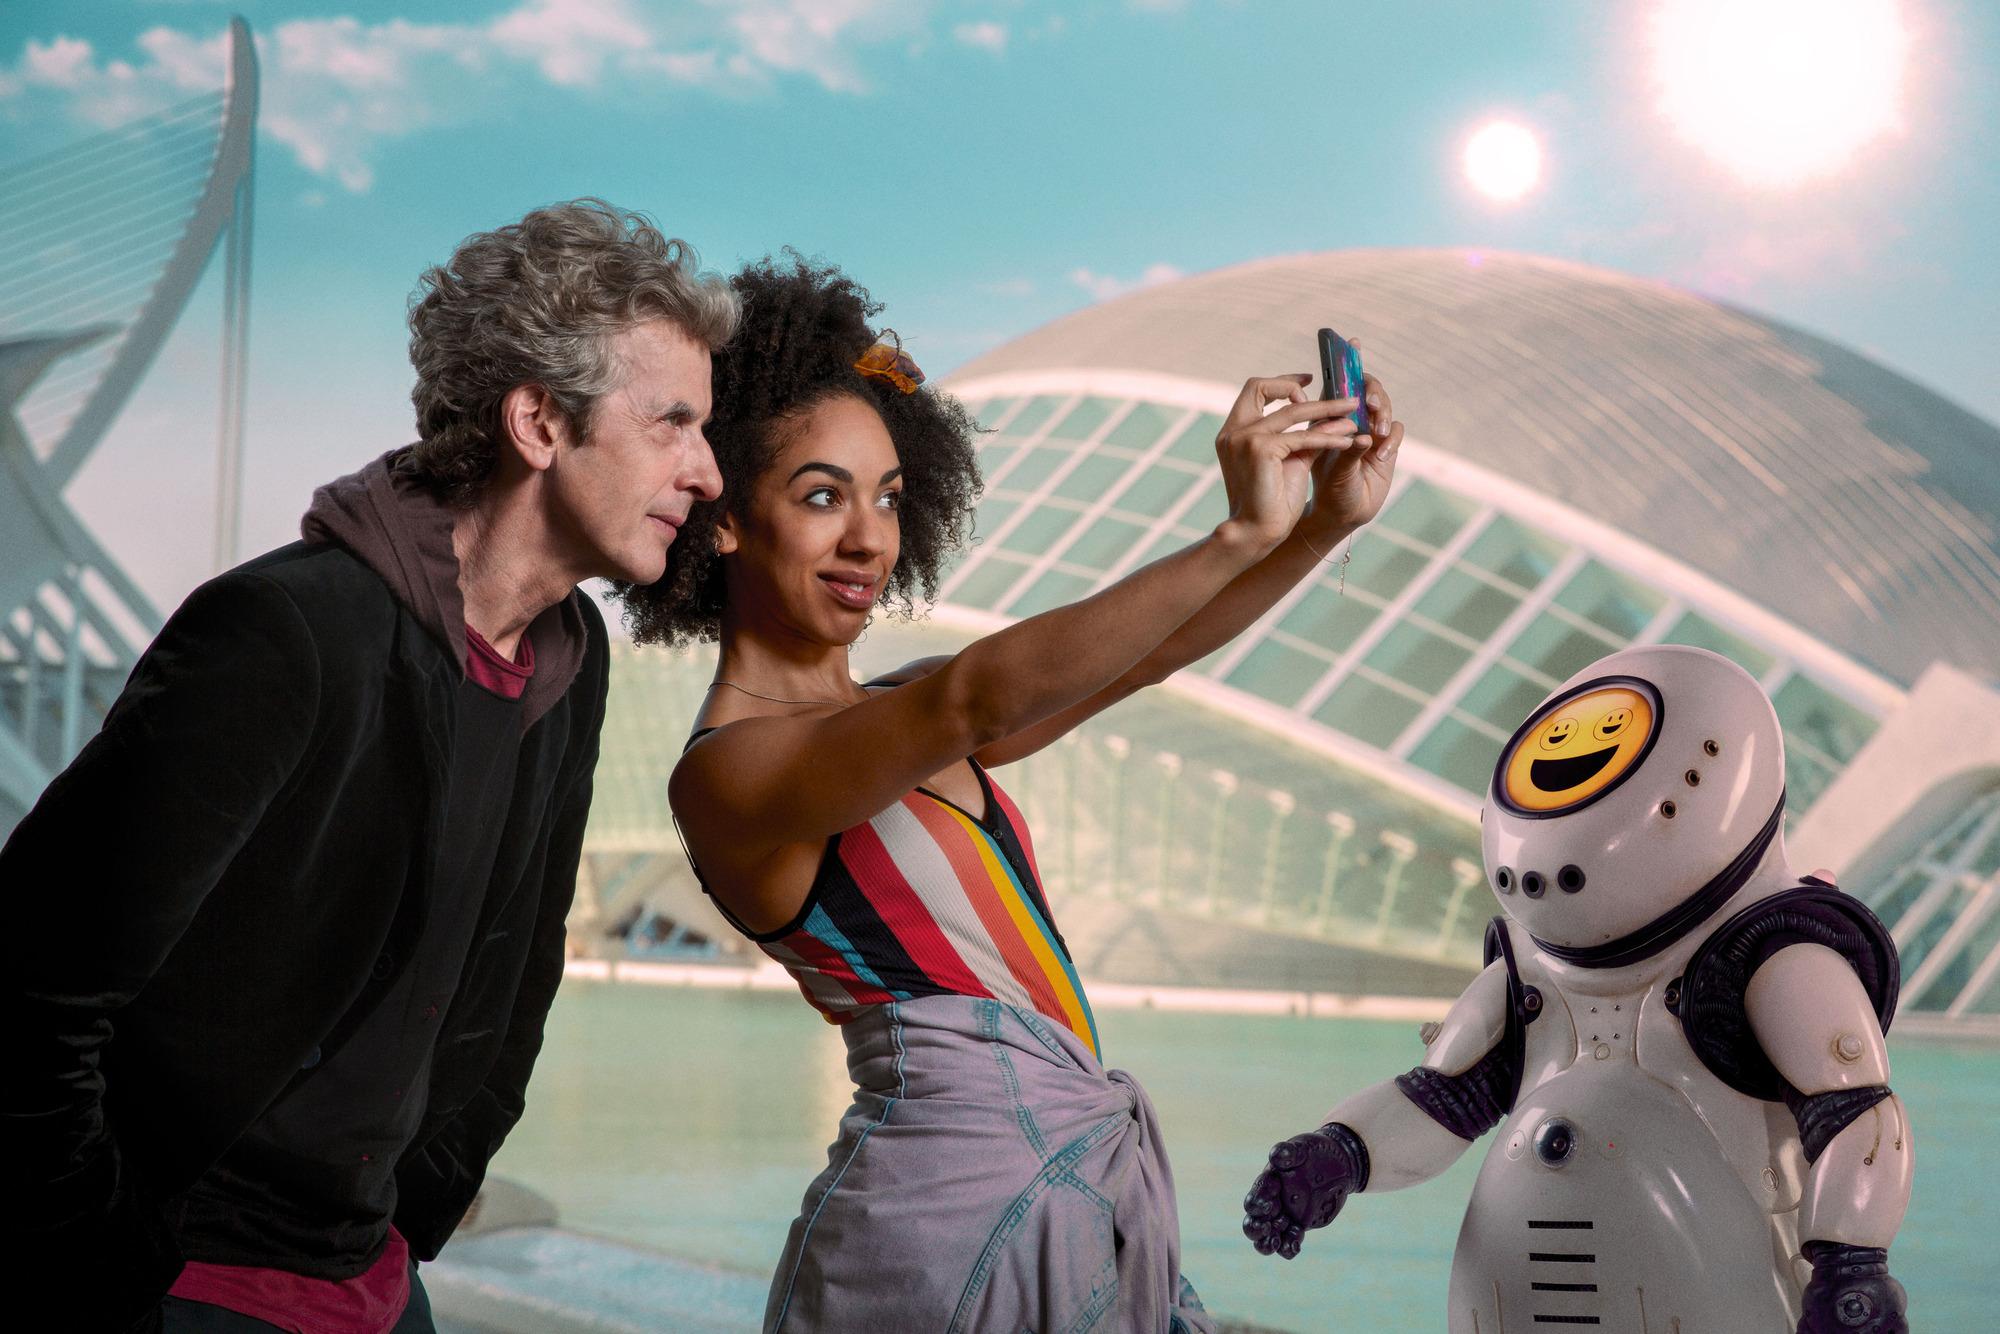 The Doctor (PETER CAPALDI), Bill (PEARL MACKIE), Emojibot